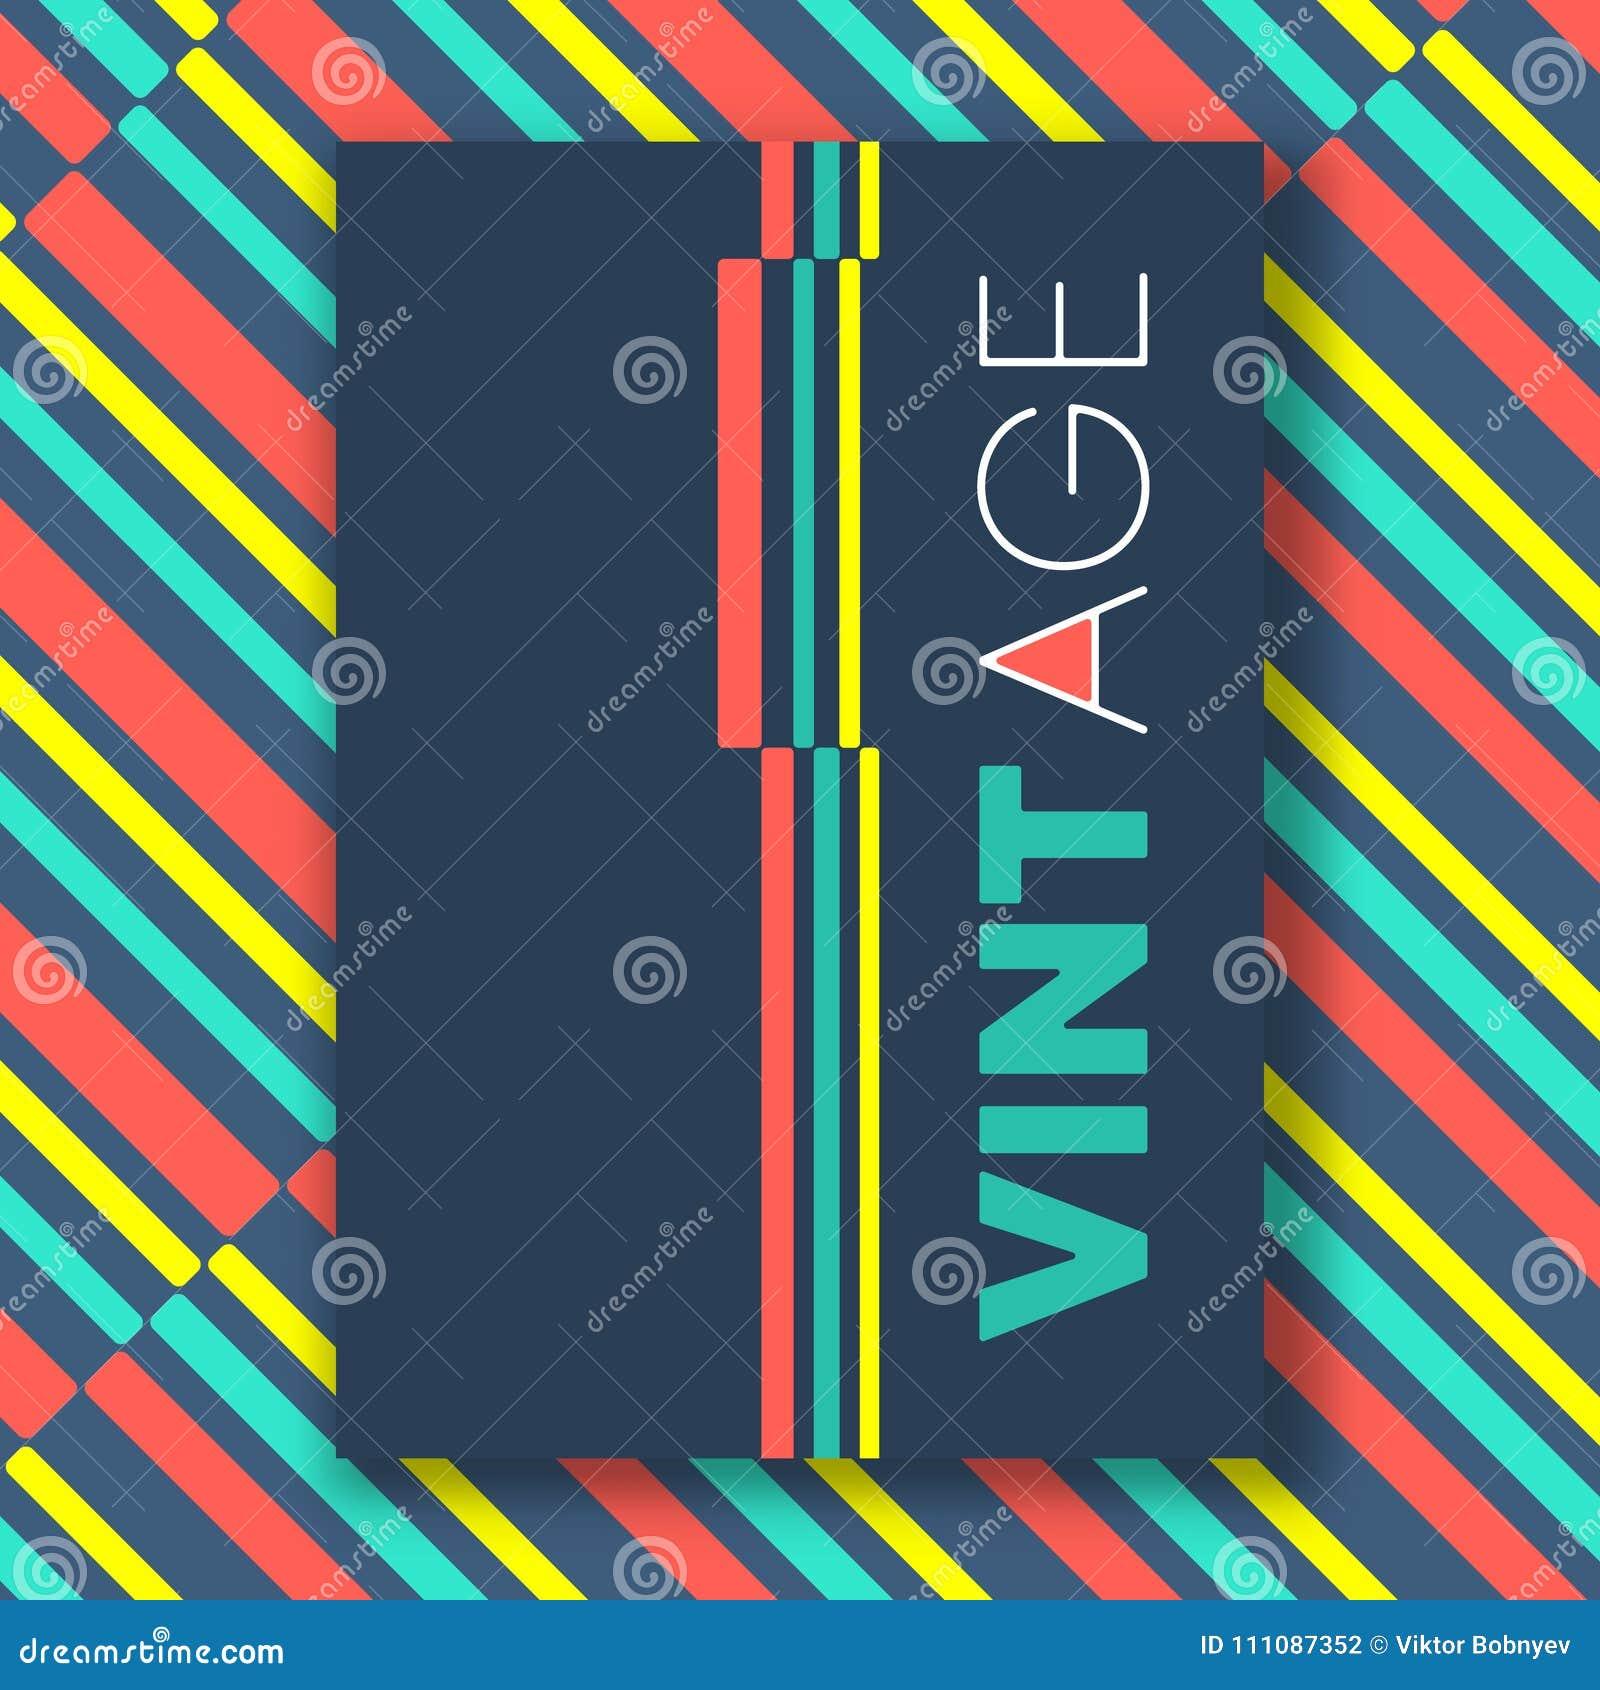 Vintage color lines poster stock vector  Illustration of